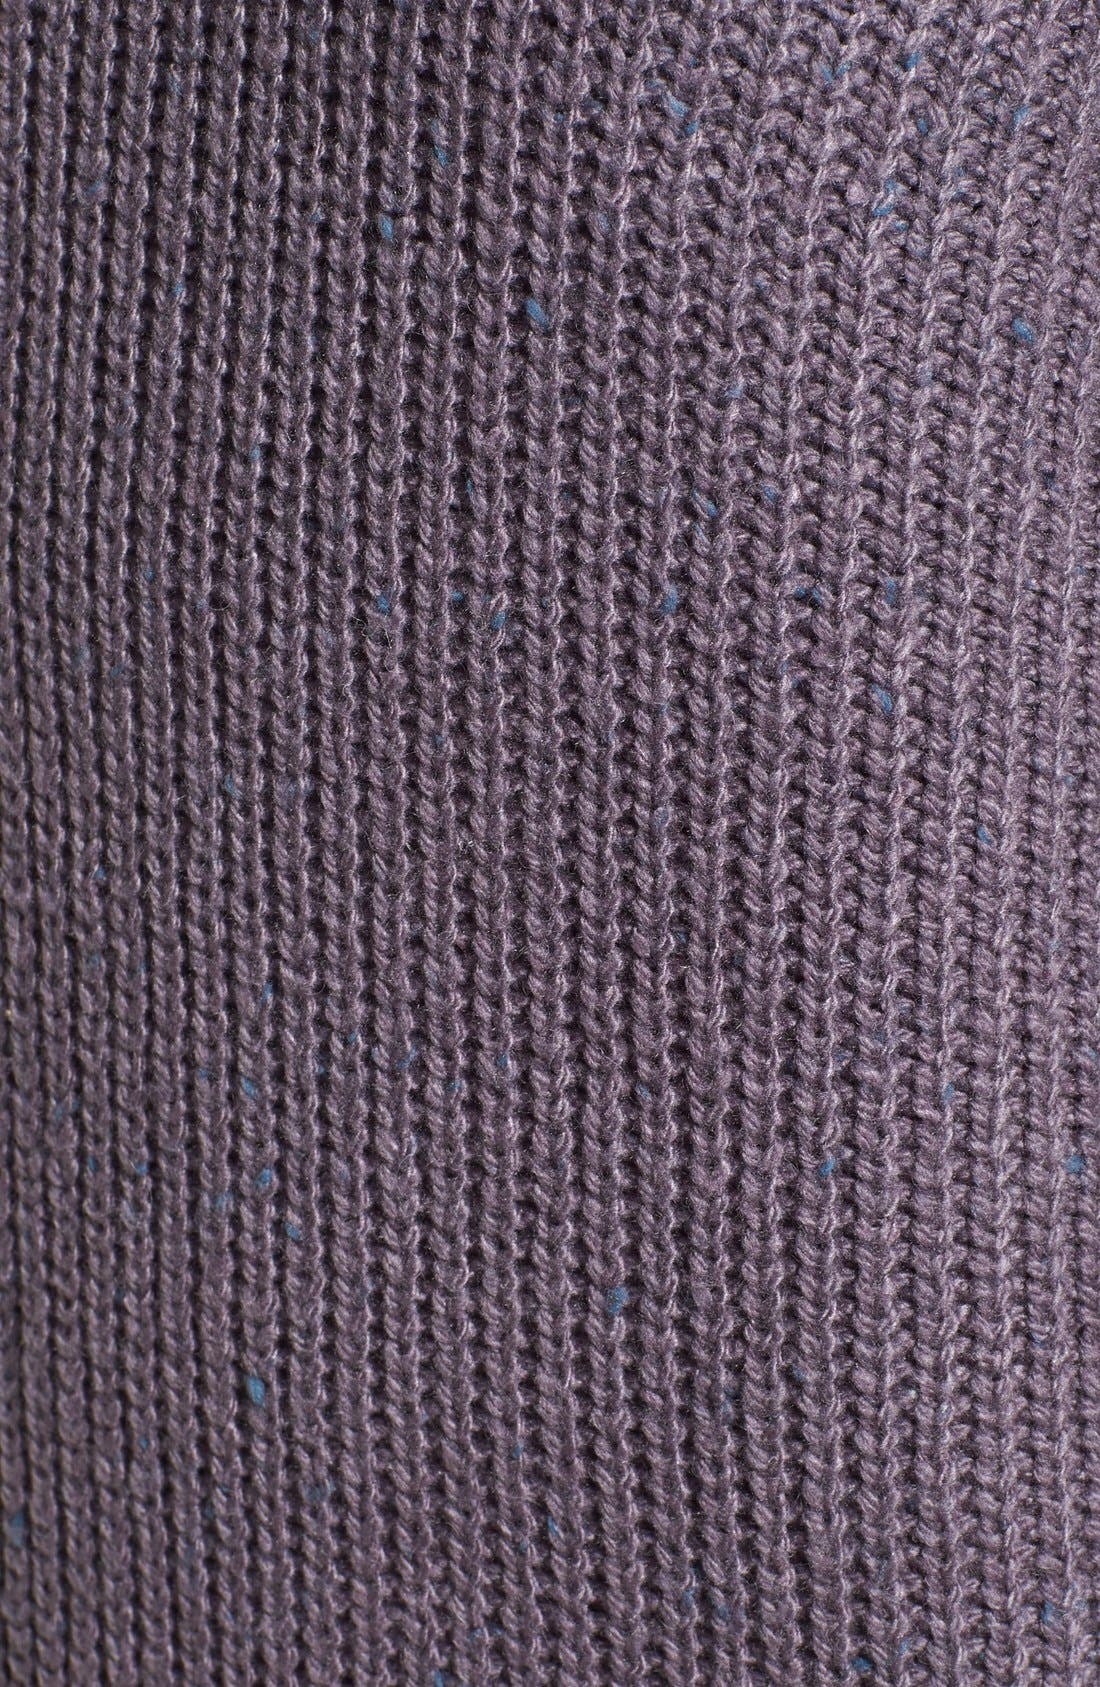 Sleeveless Turtleneck Sweater Dress,                             Alternate thumbnail 2, color,                             021